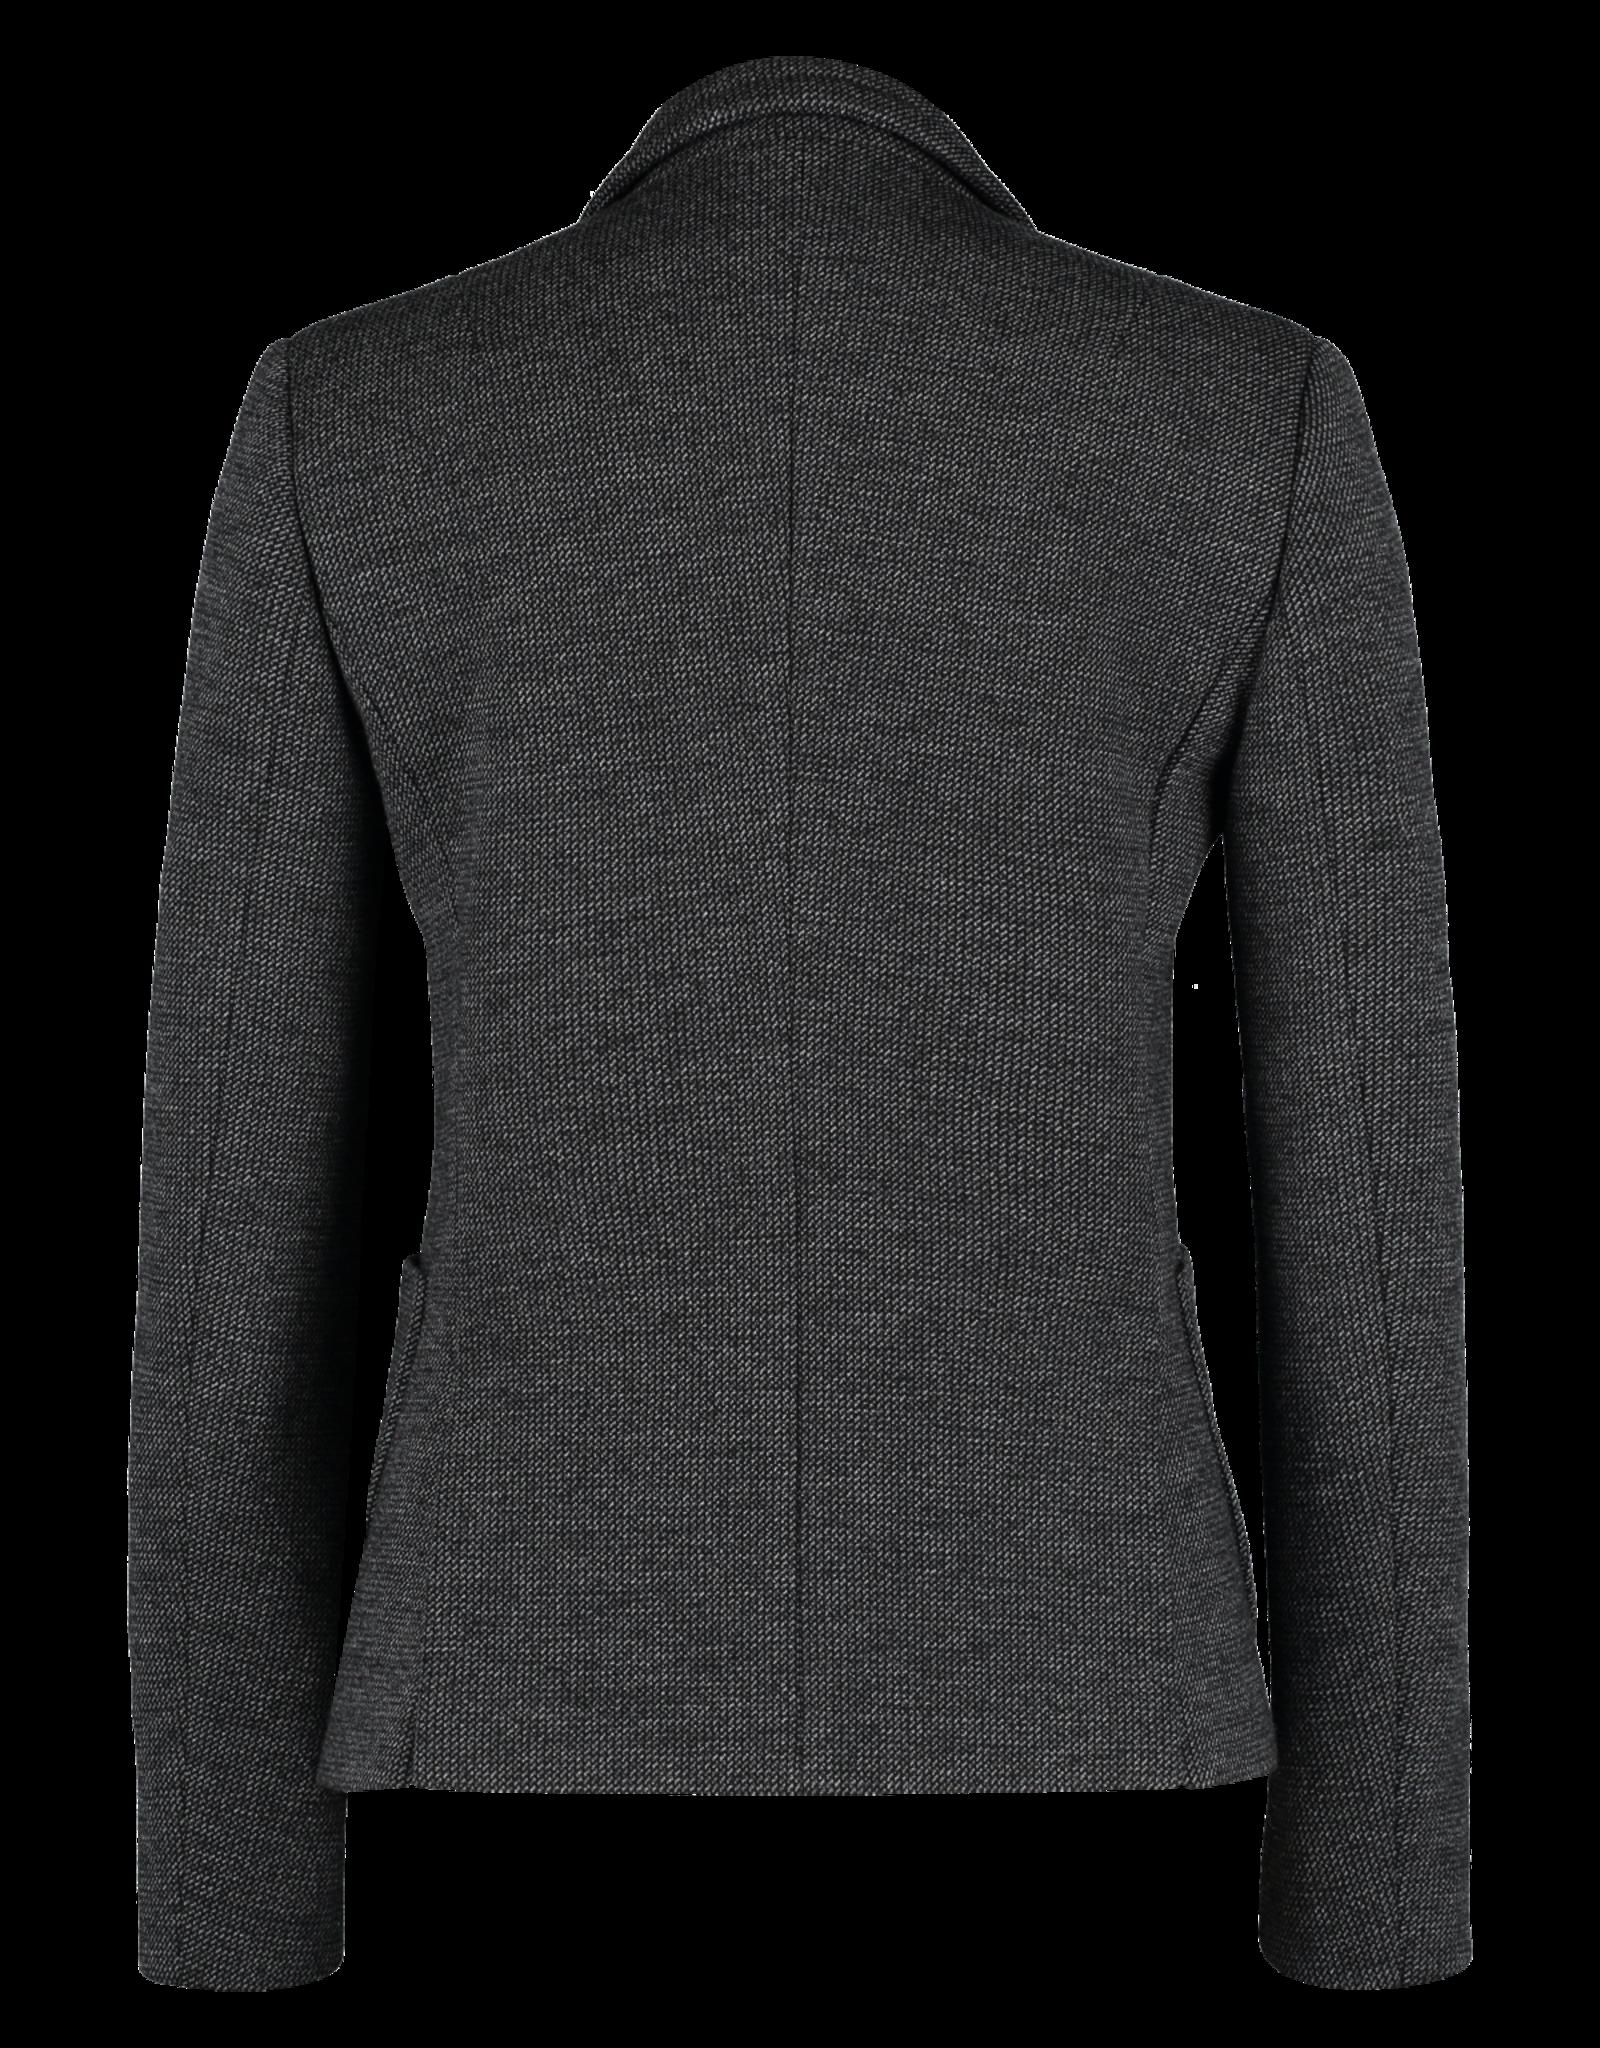 AW1920 404-Q Neo Jacket